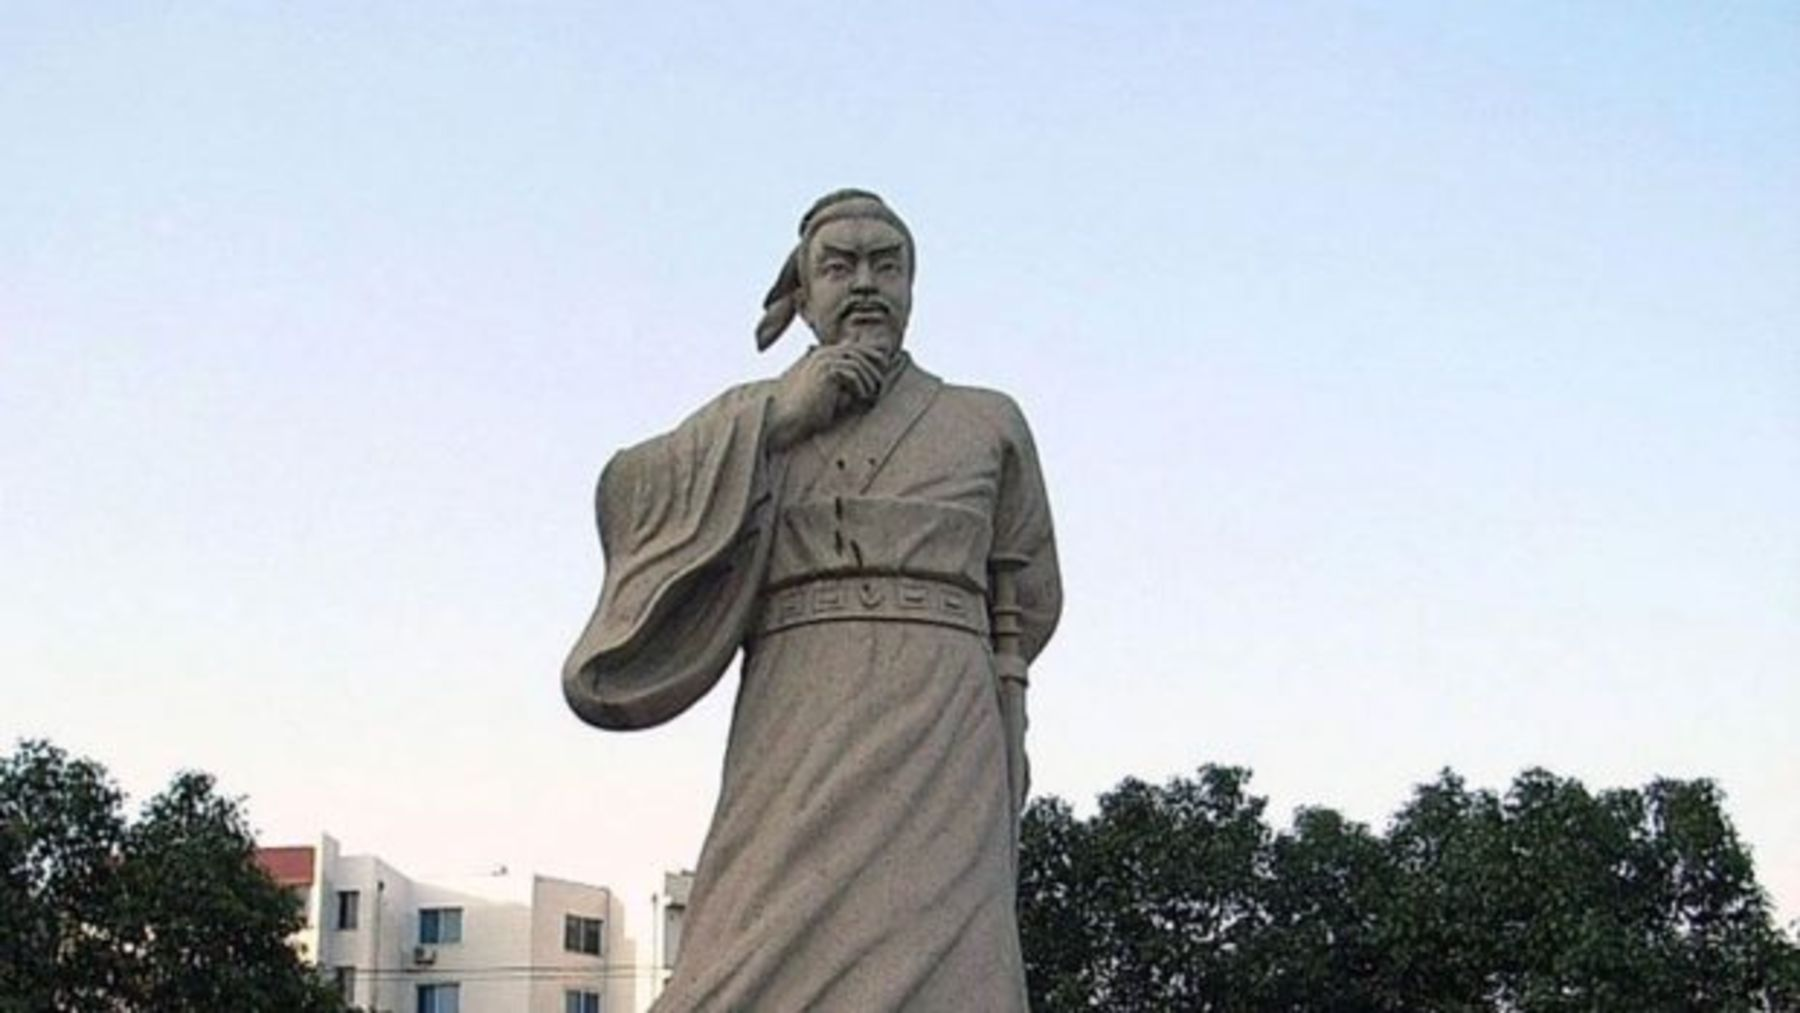 Descubre las mejores frases de Sun Tzu